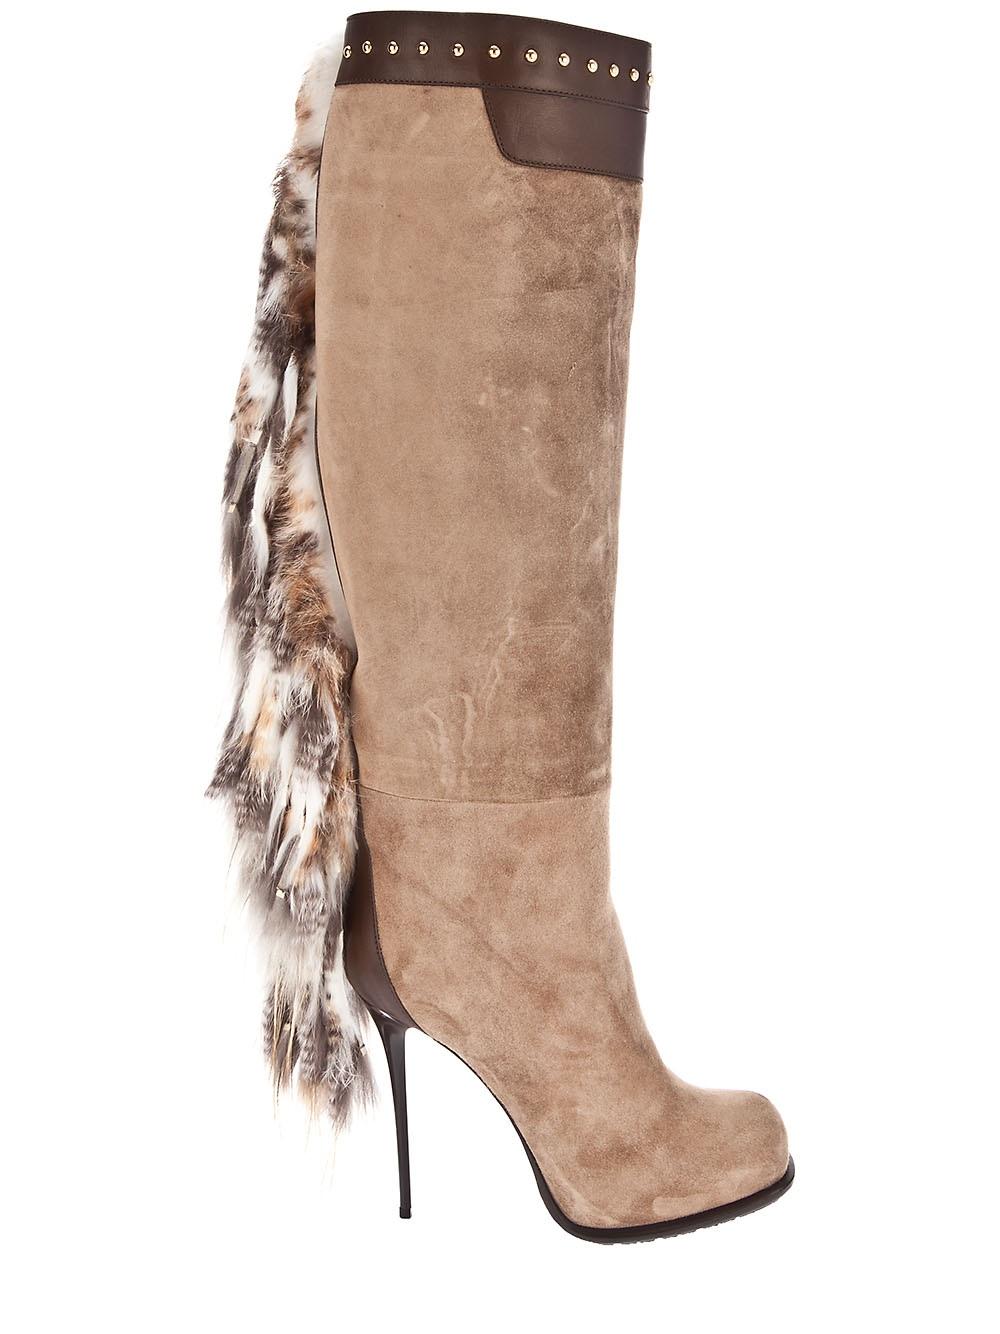 Gianmarco Lorenzi Long Boot With Fur Tassel In Natural Lyst